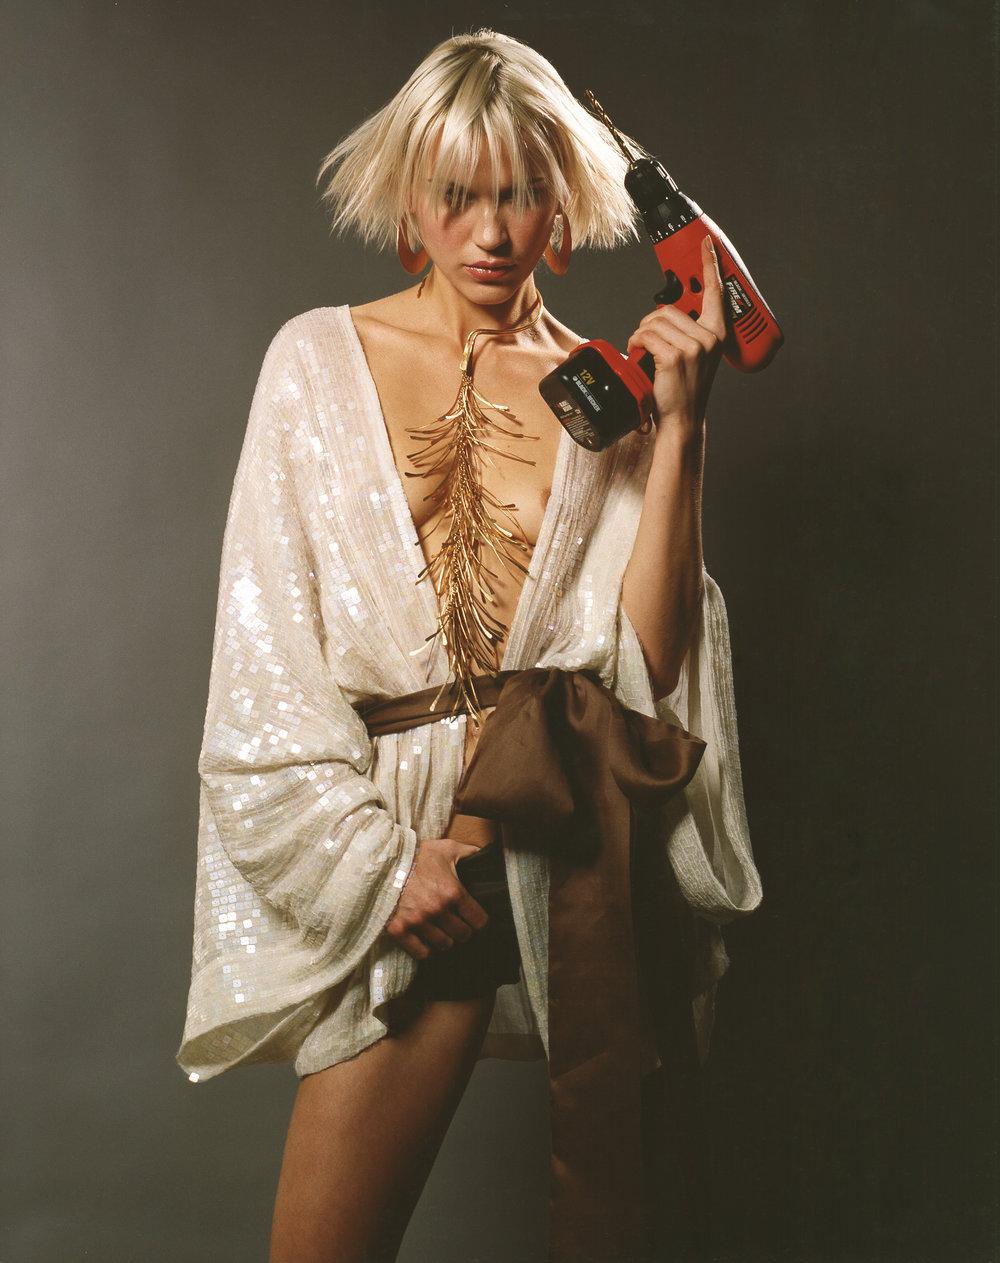 Fashion pics for website 005.jpg